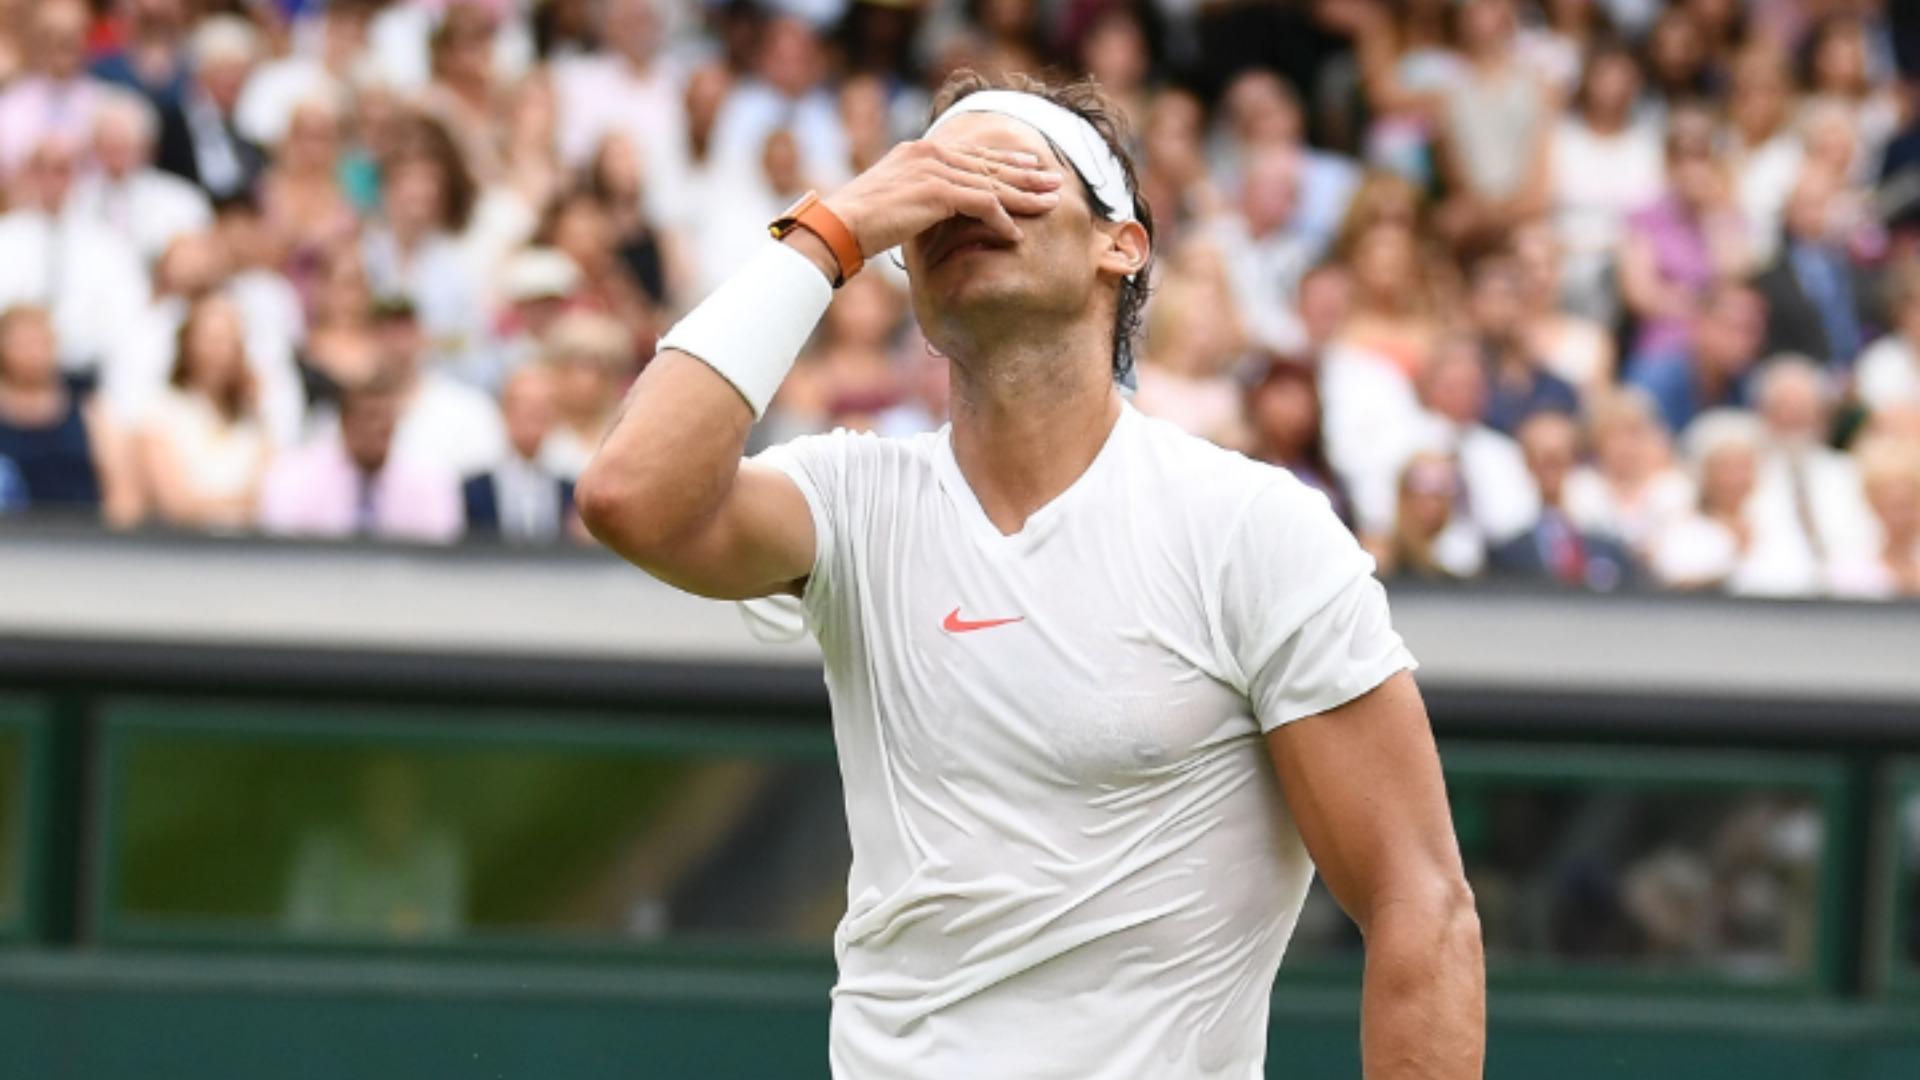 Wimbledon seeding is disrespectful, says Nadal